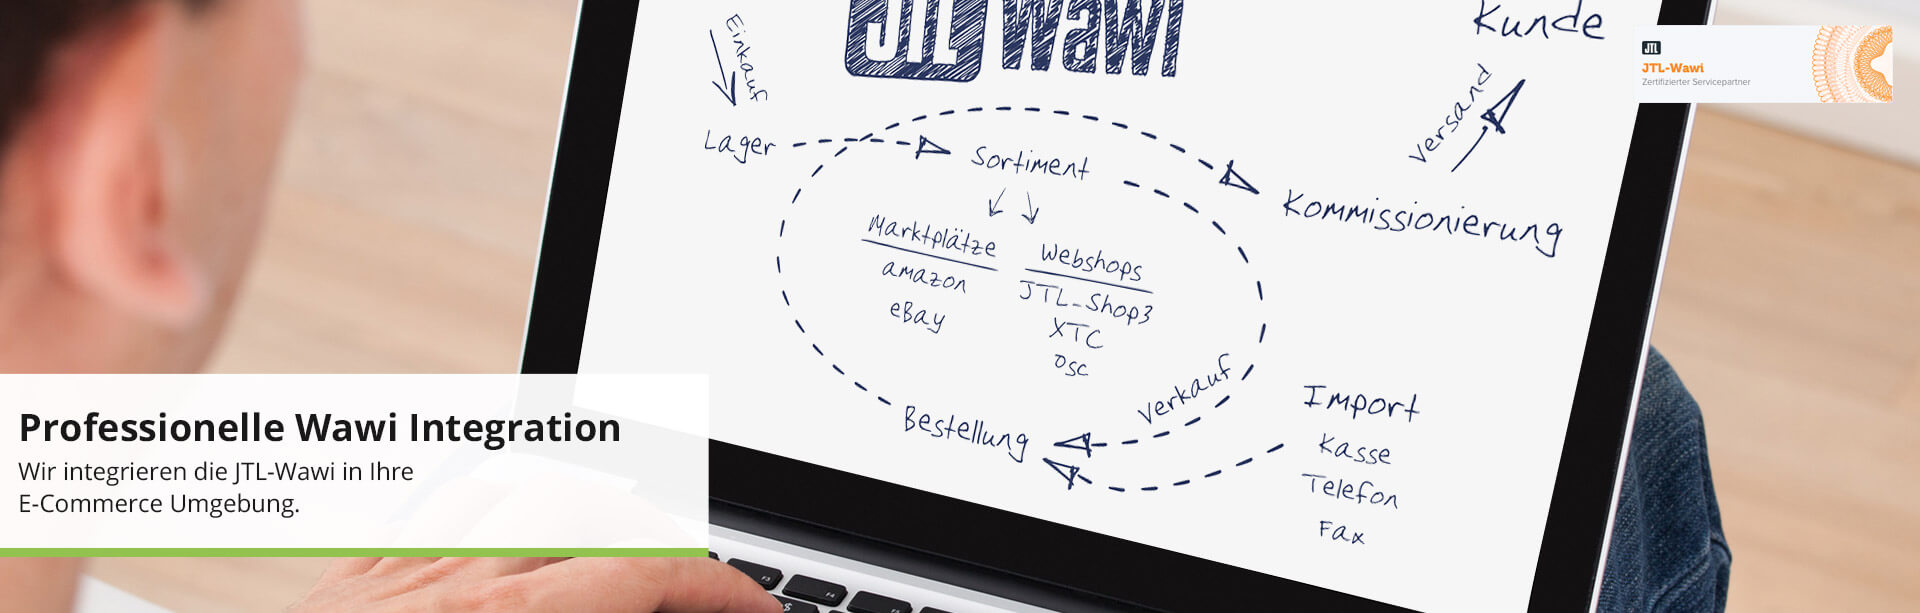 Professionelle Wawi Integration